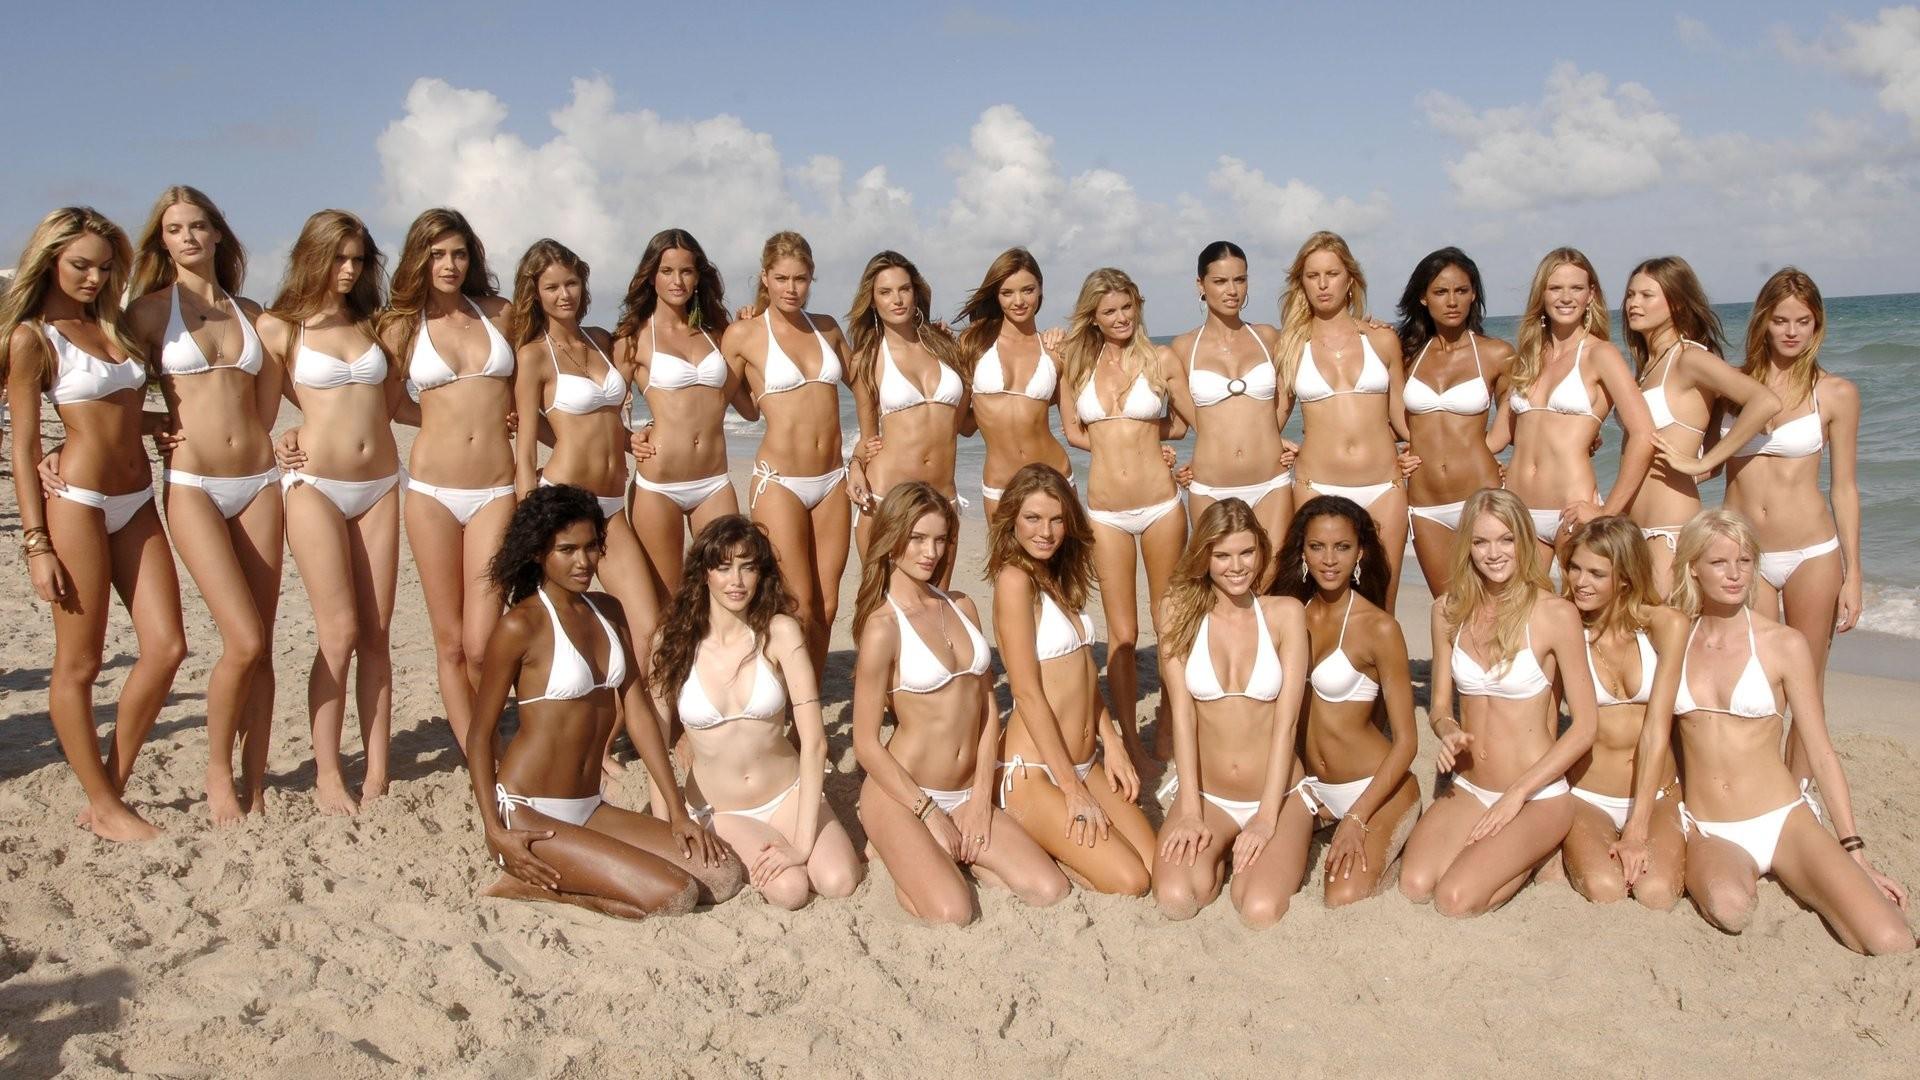 Sexy beach bunnies in bikini open a bag full of dildos for hot lesbian orgy № 831171 бесплатно